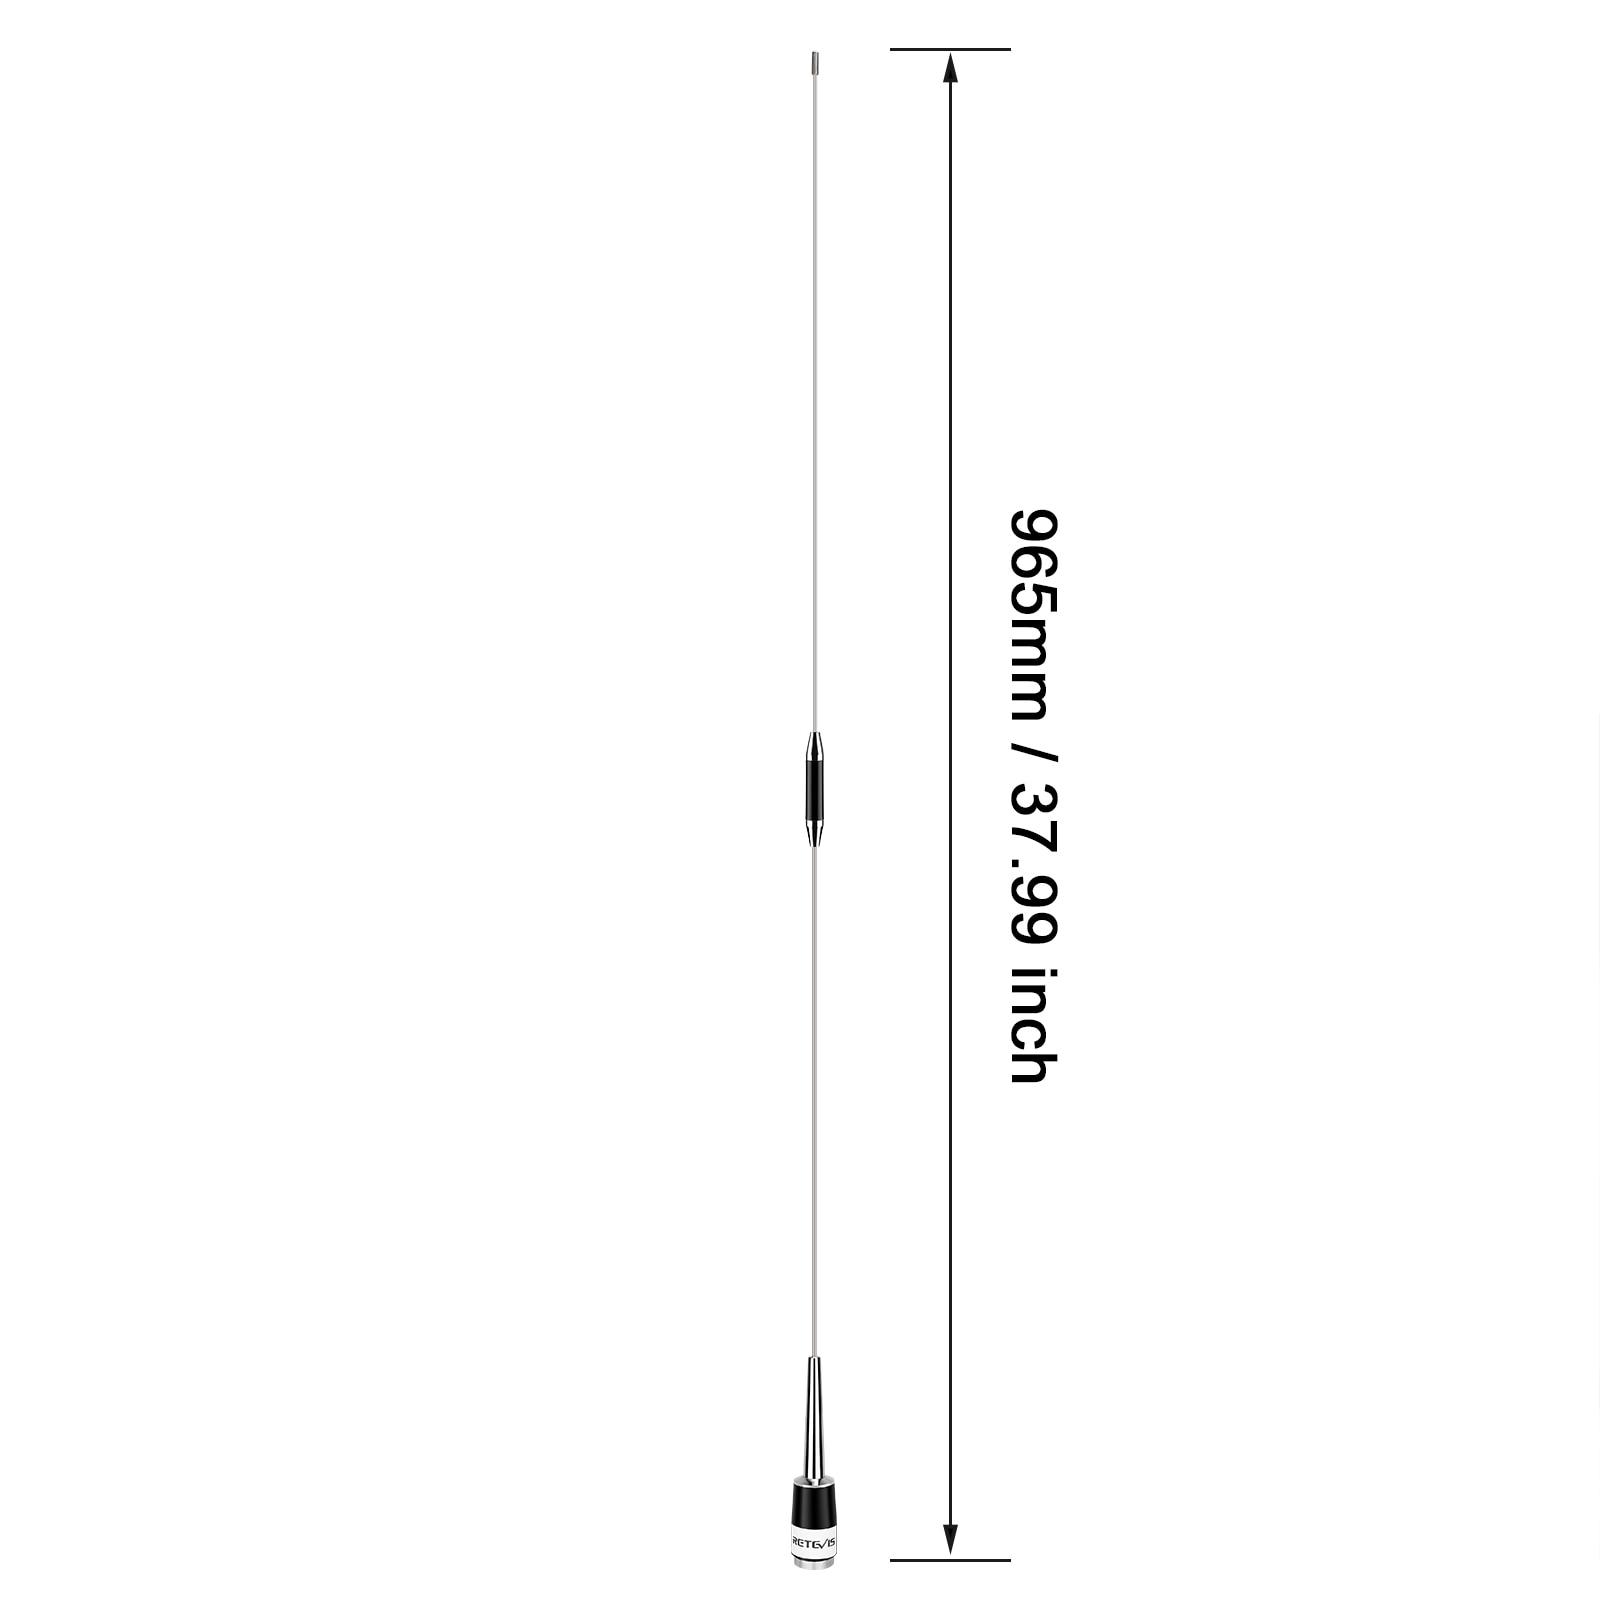 Retevis MA08 Omni-Directional Mobile Car Radio Antenna Walkie-Talkie UHF 400-470MHz 200W 5.5dBi with PL-259/SL16-J/M Connector enlarge